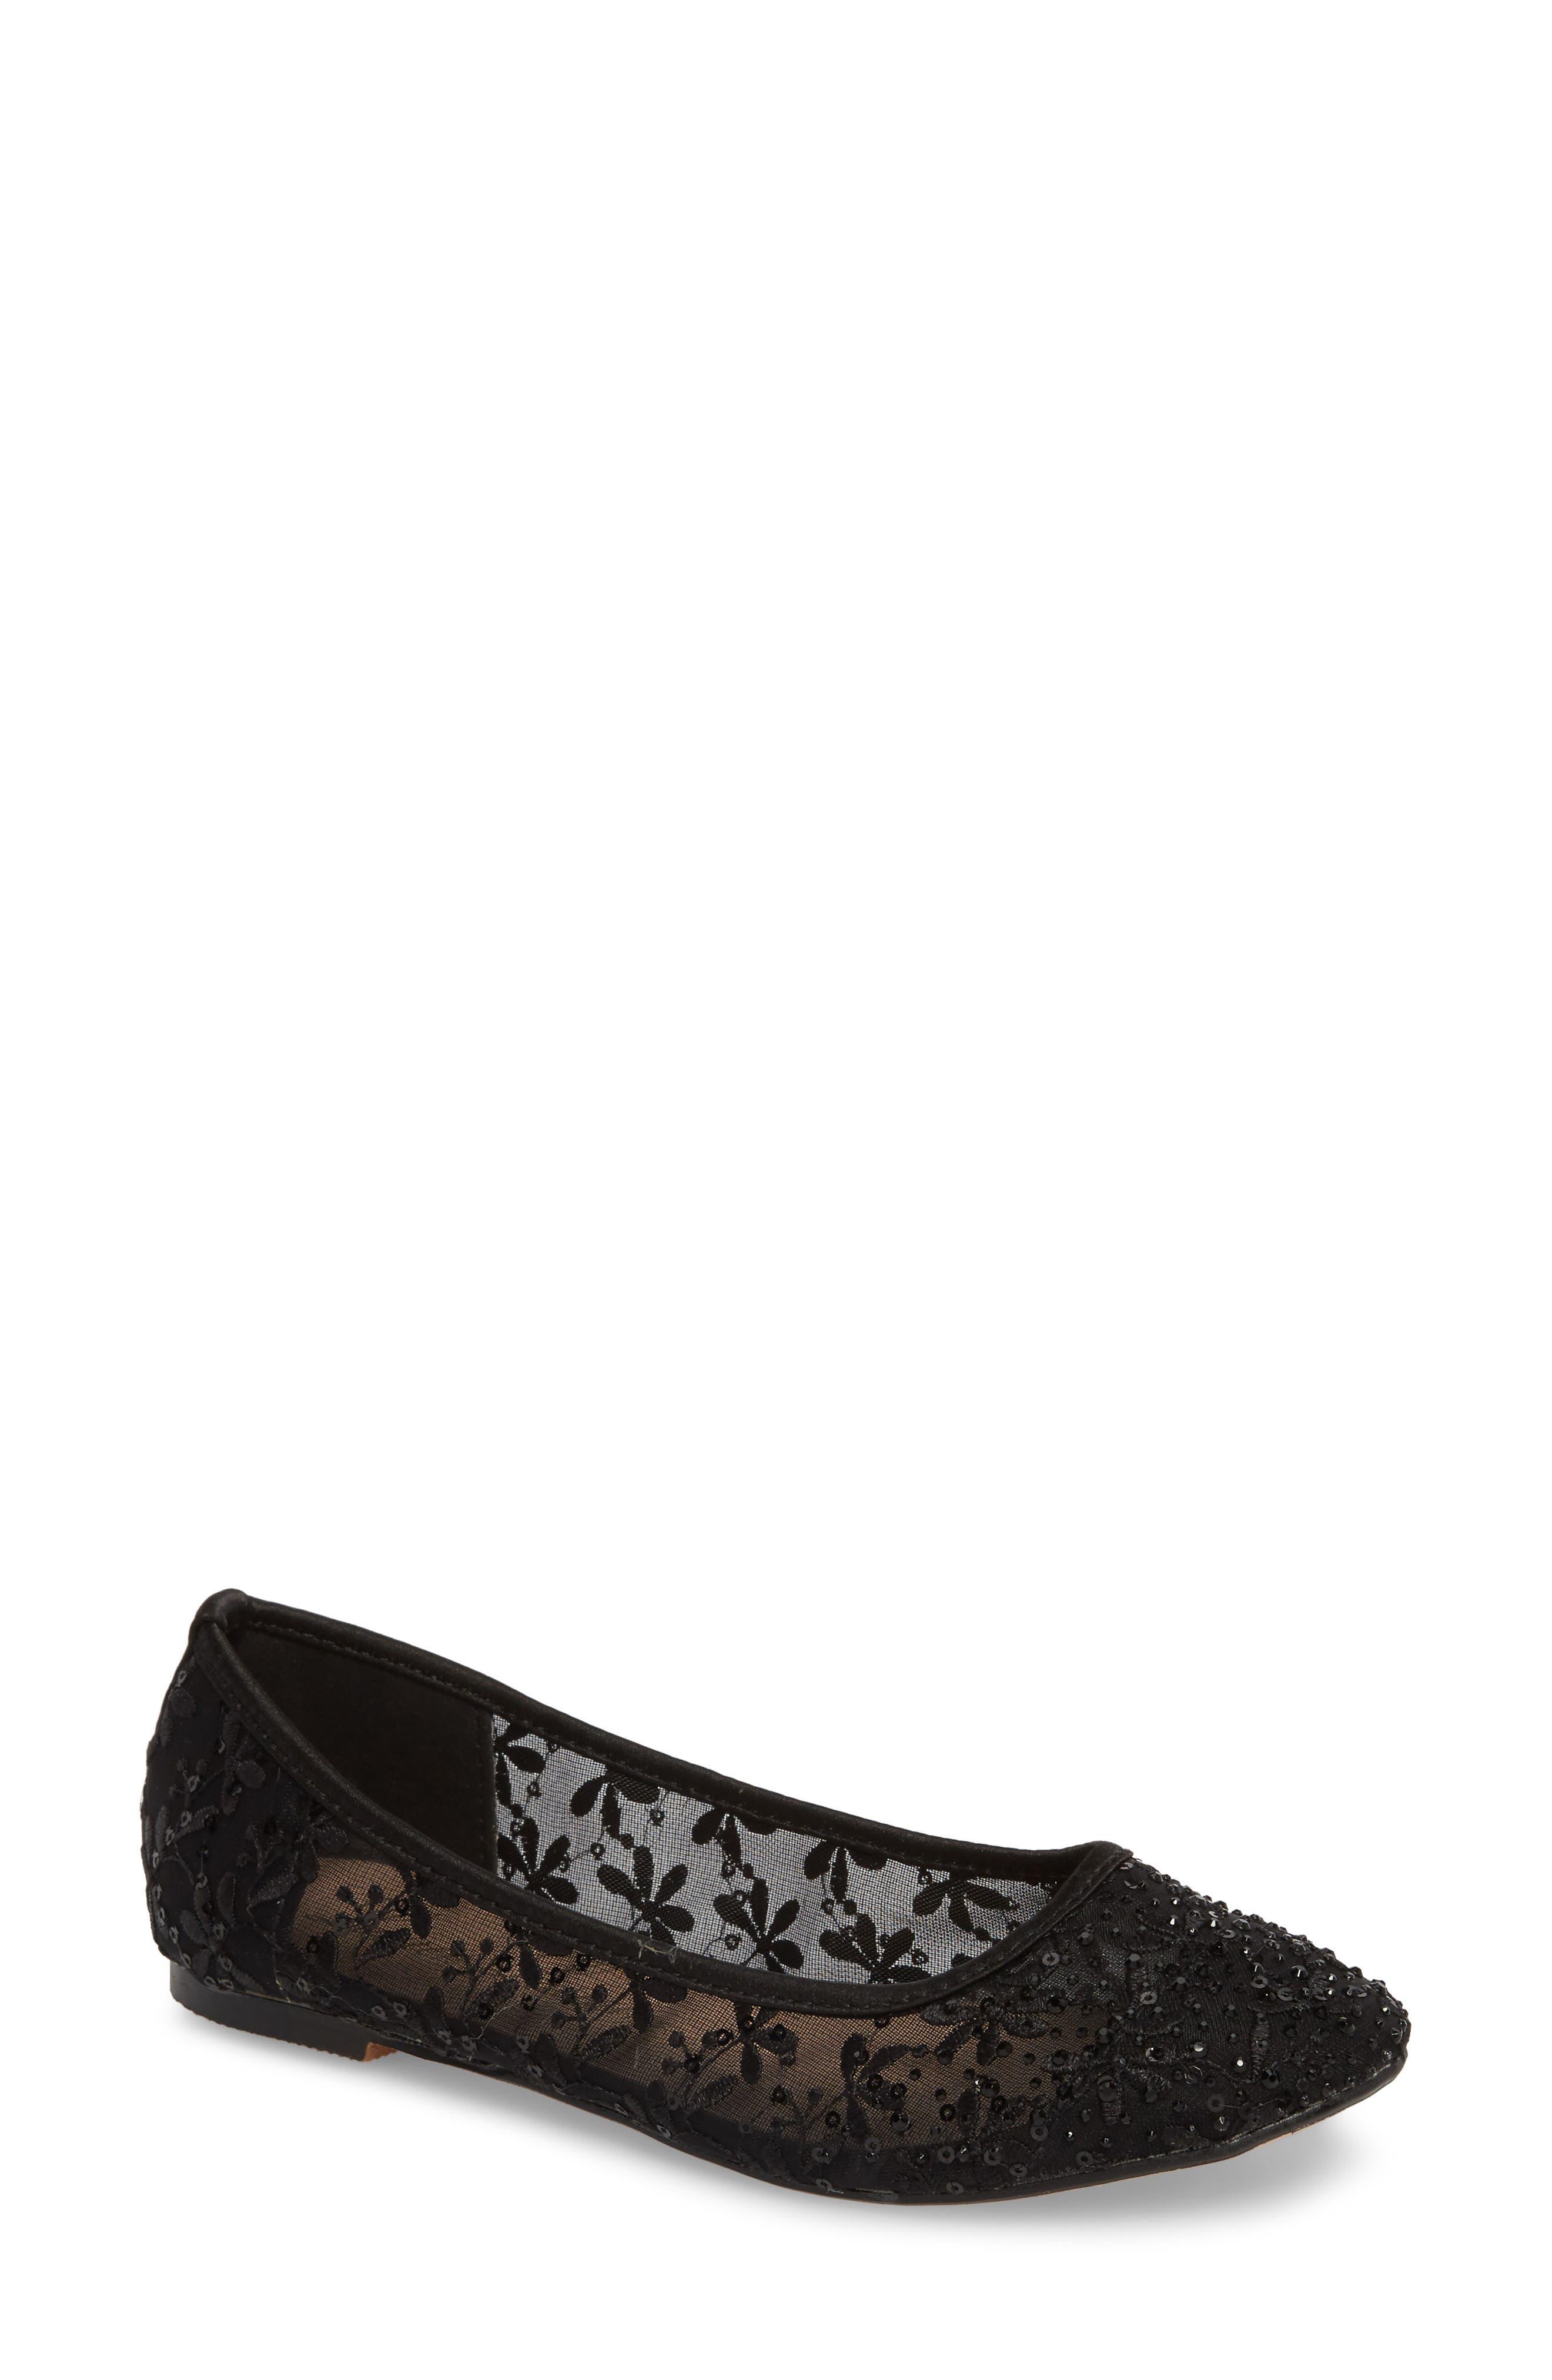 Betsy Embellished Flat,                             Main thumbnail 1, color,                             Black Fabric